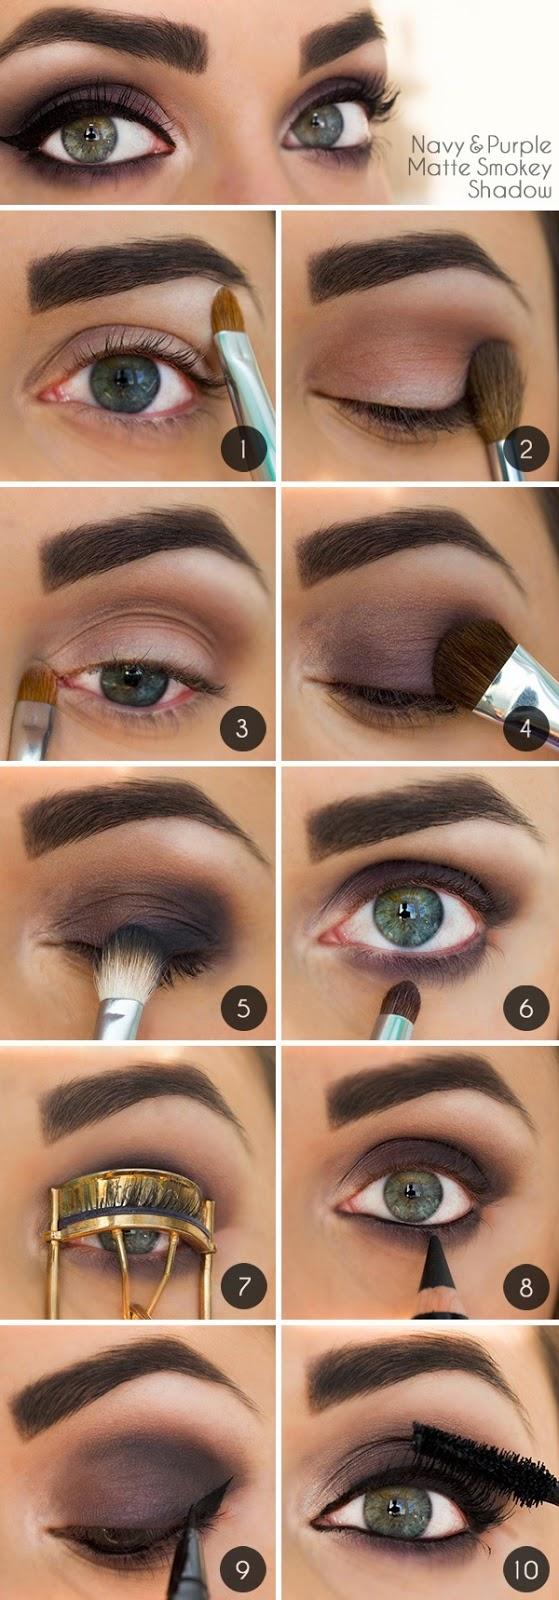 Eye Makeup Must-Try: Navy & Purple Smokey Eye